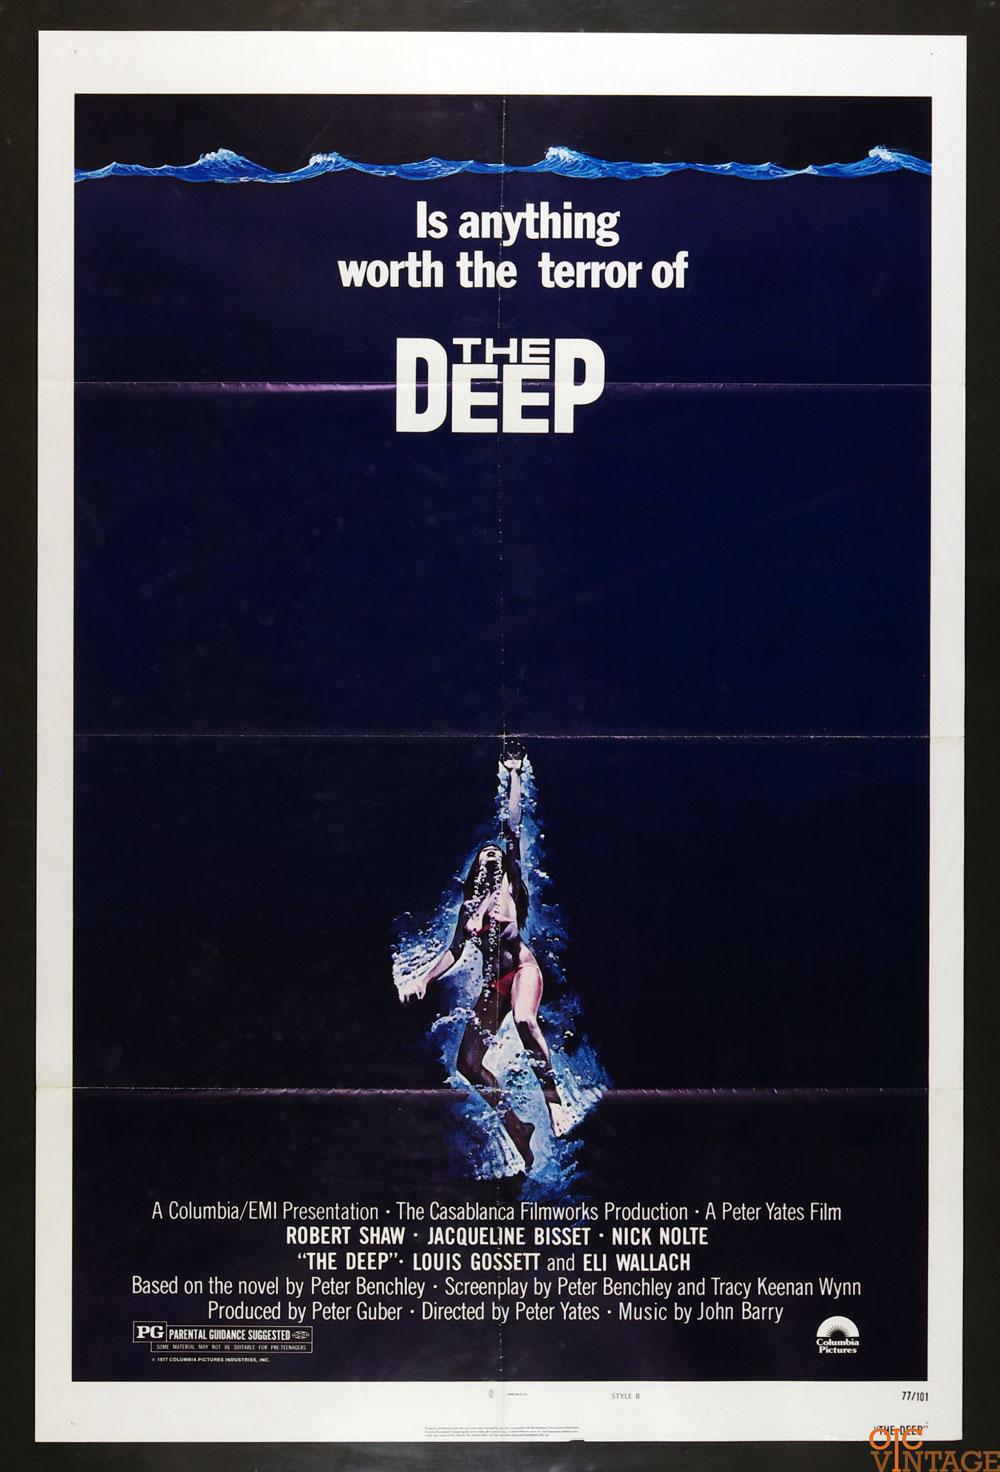 The Deep Movie Poster 1977 Jacqueline Bisset Nick Nolte 27x41 1 Sheet